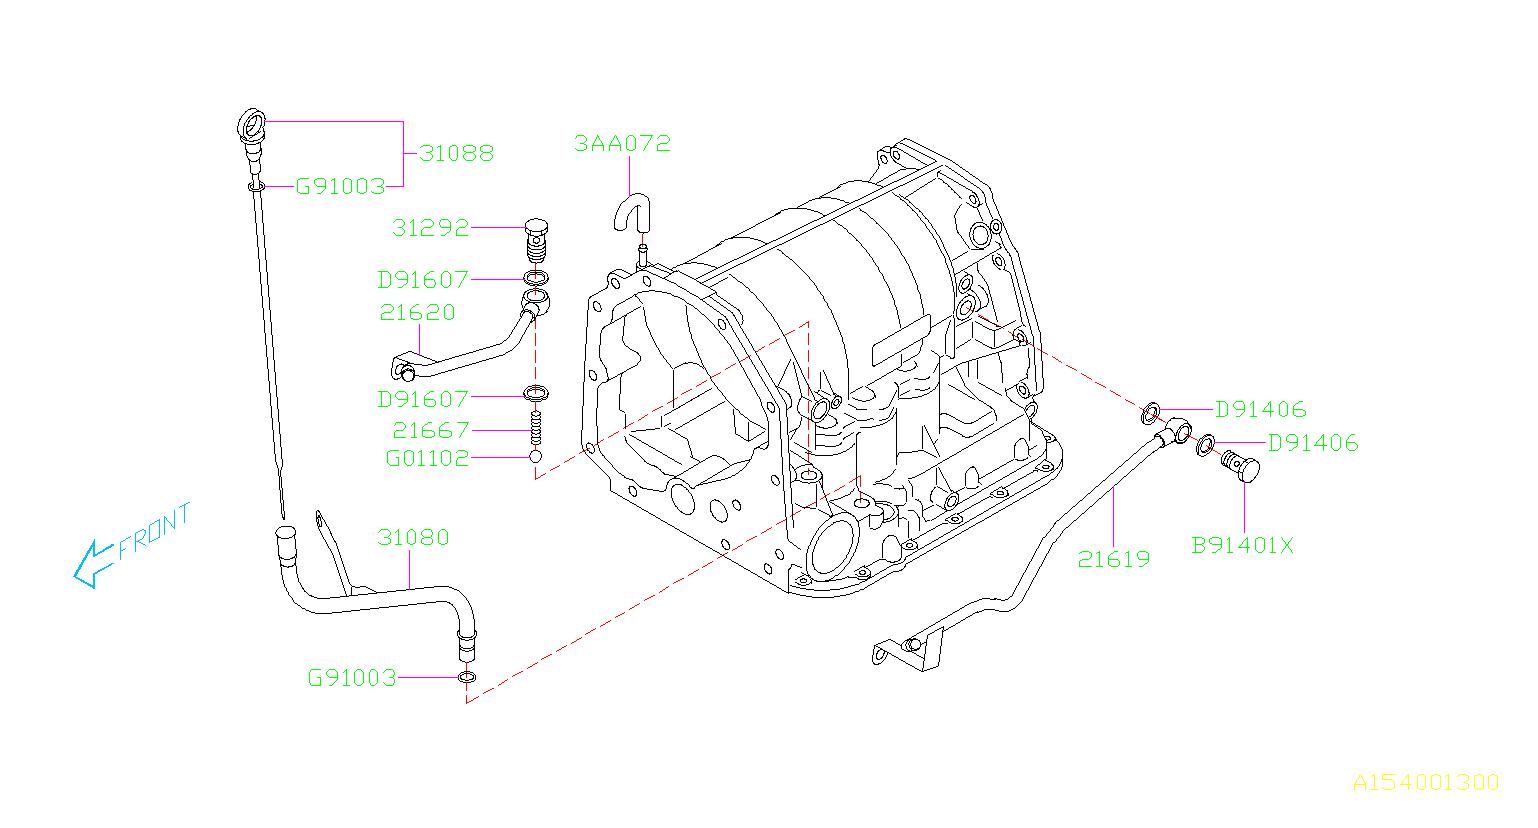 Subaru Impreza Automatic Transmission Dipstick  Gauge At Fluid Level